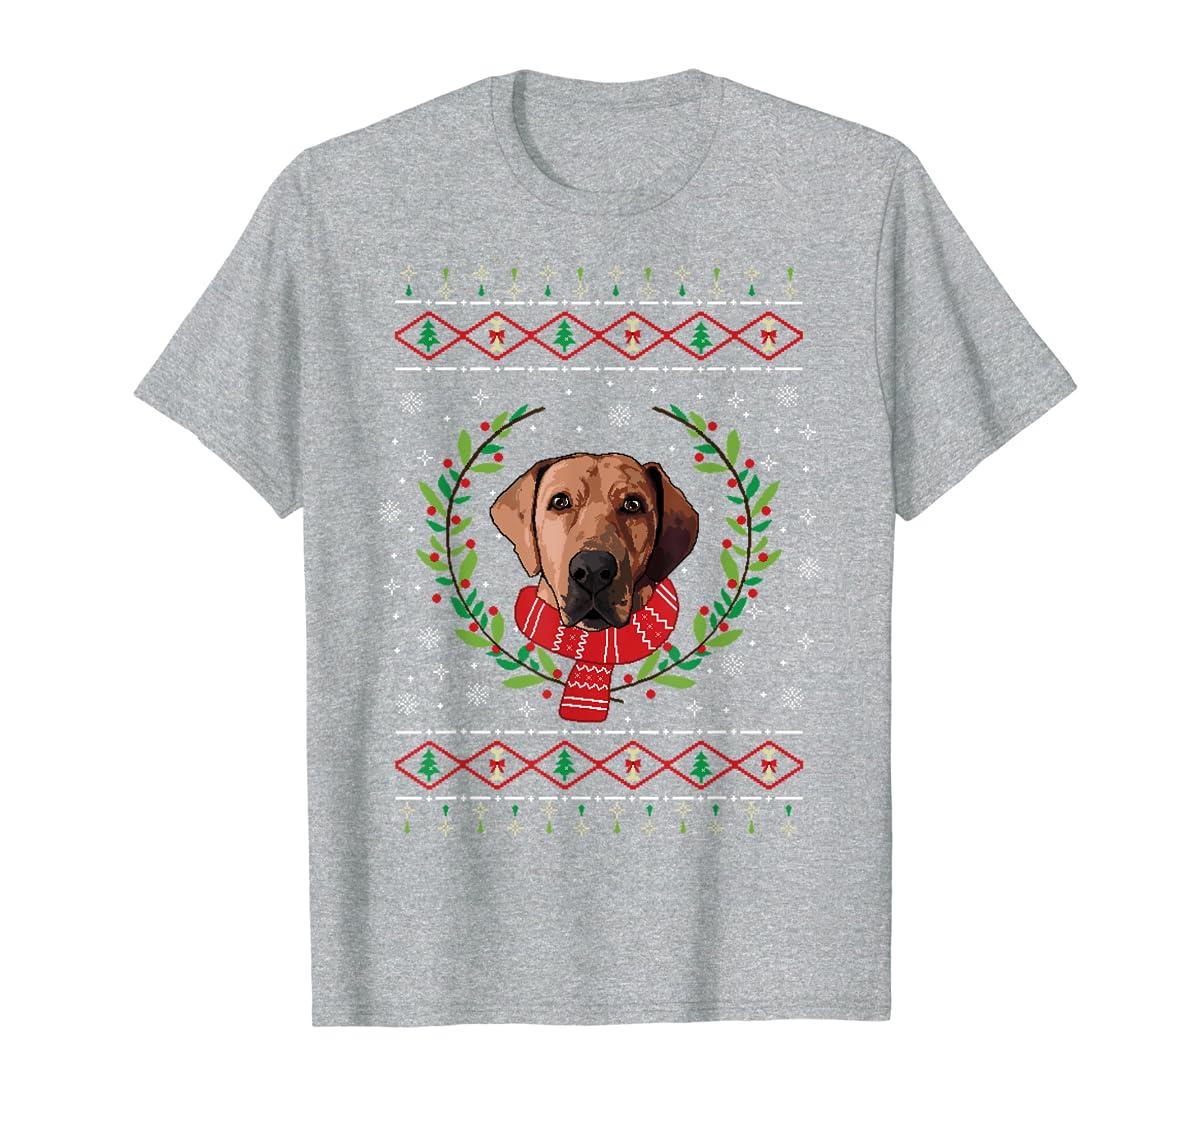 Broholmer Ugly Christmas Jumper T-Shirt Gift T-Shirt-Men's T-Shirt-Sport Grey